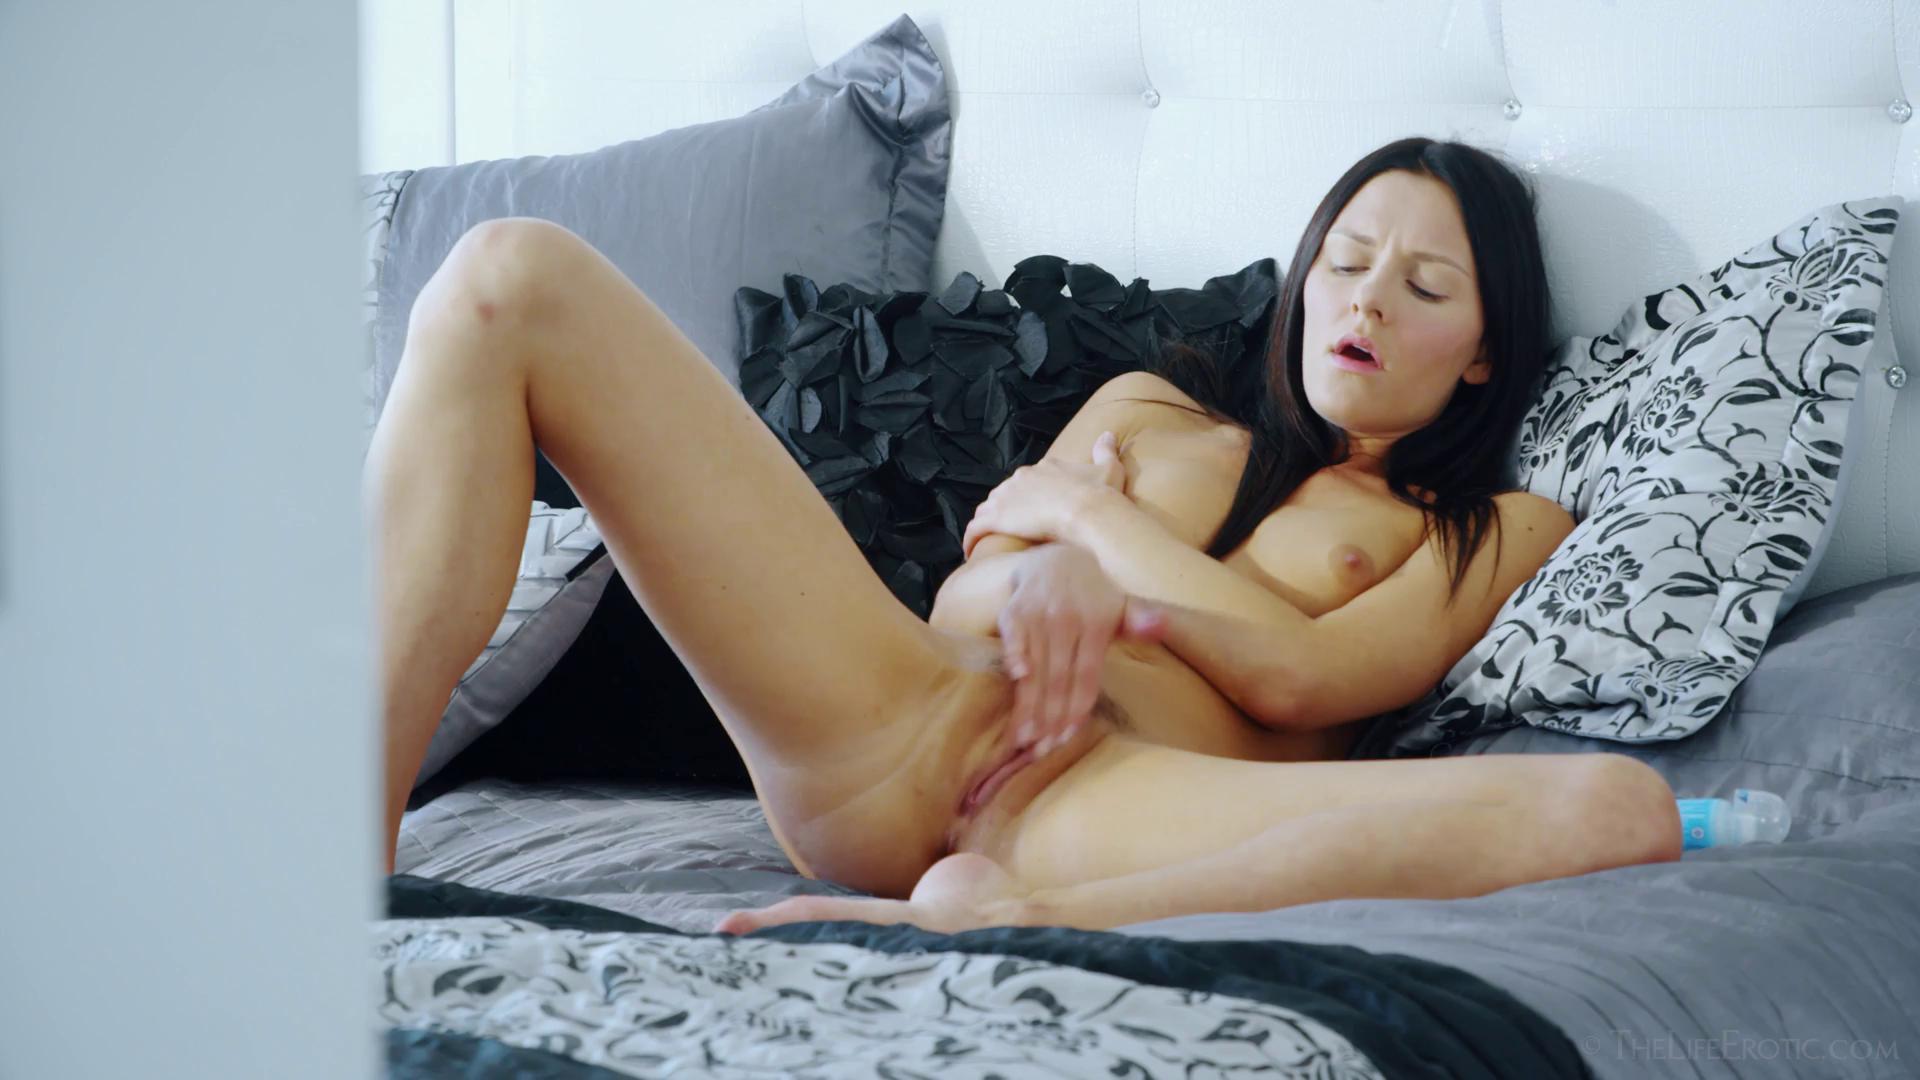 TheLifeErotic – Kira Zen Orgasm Obsession